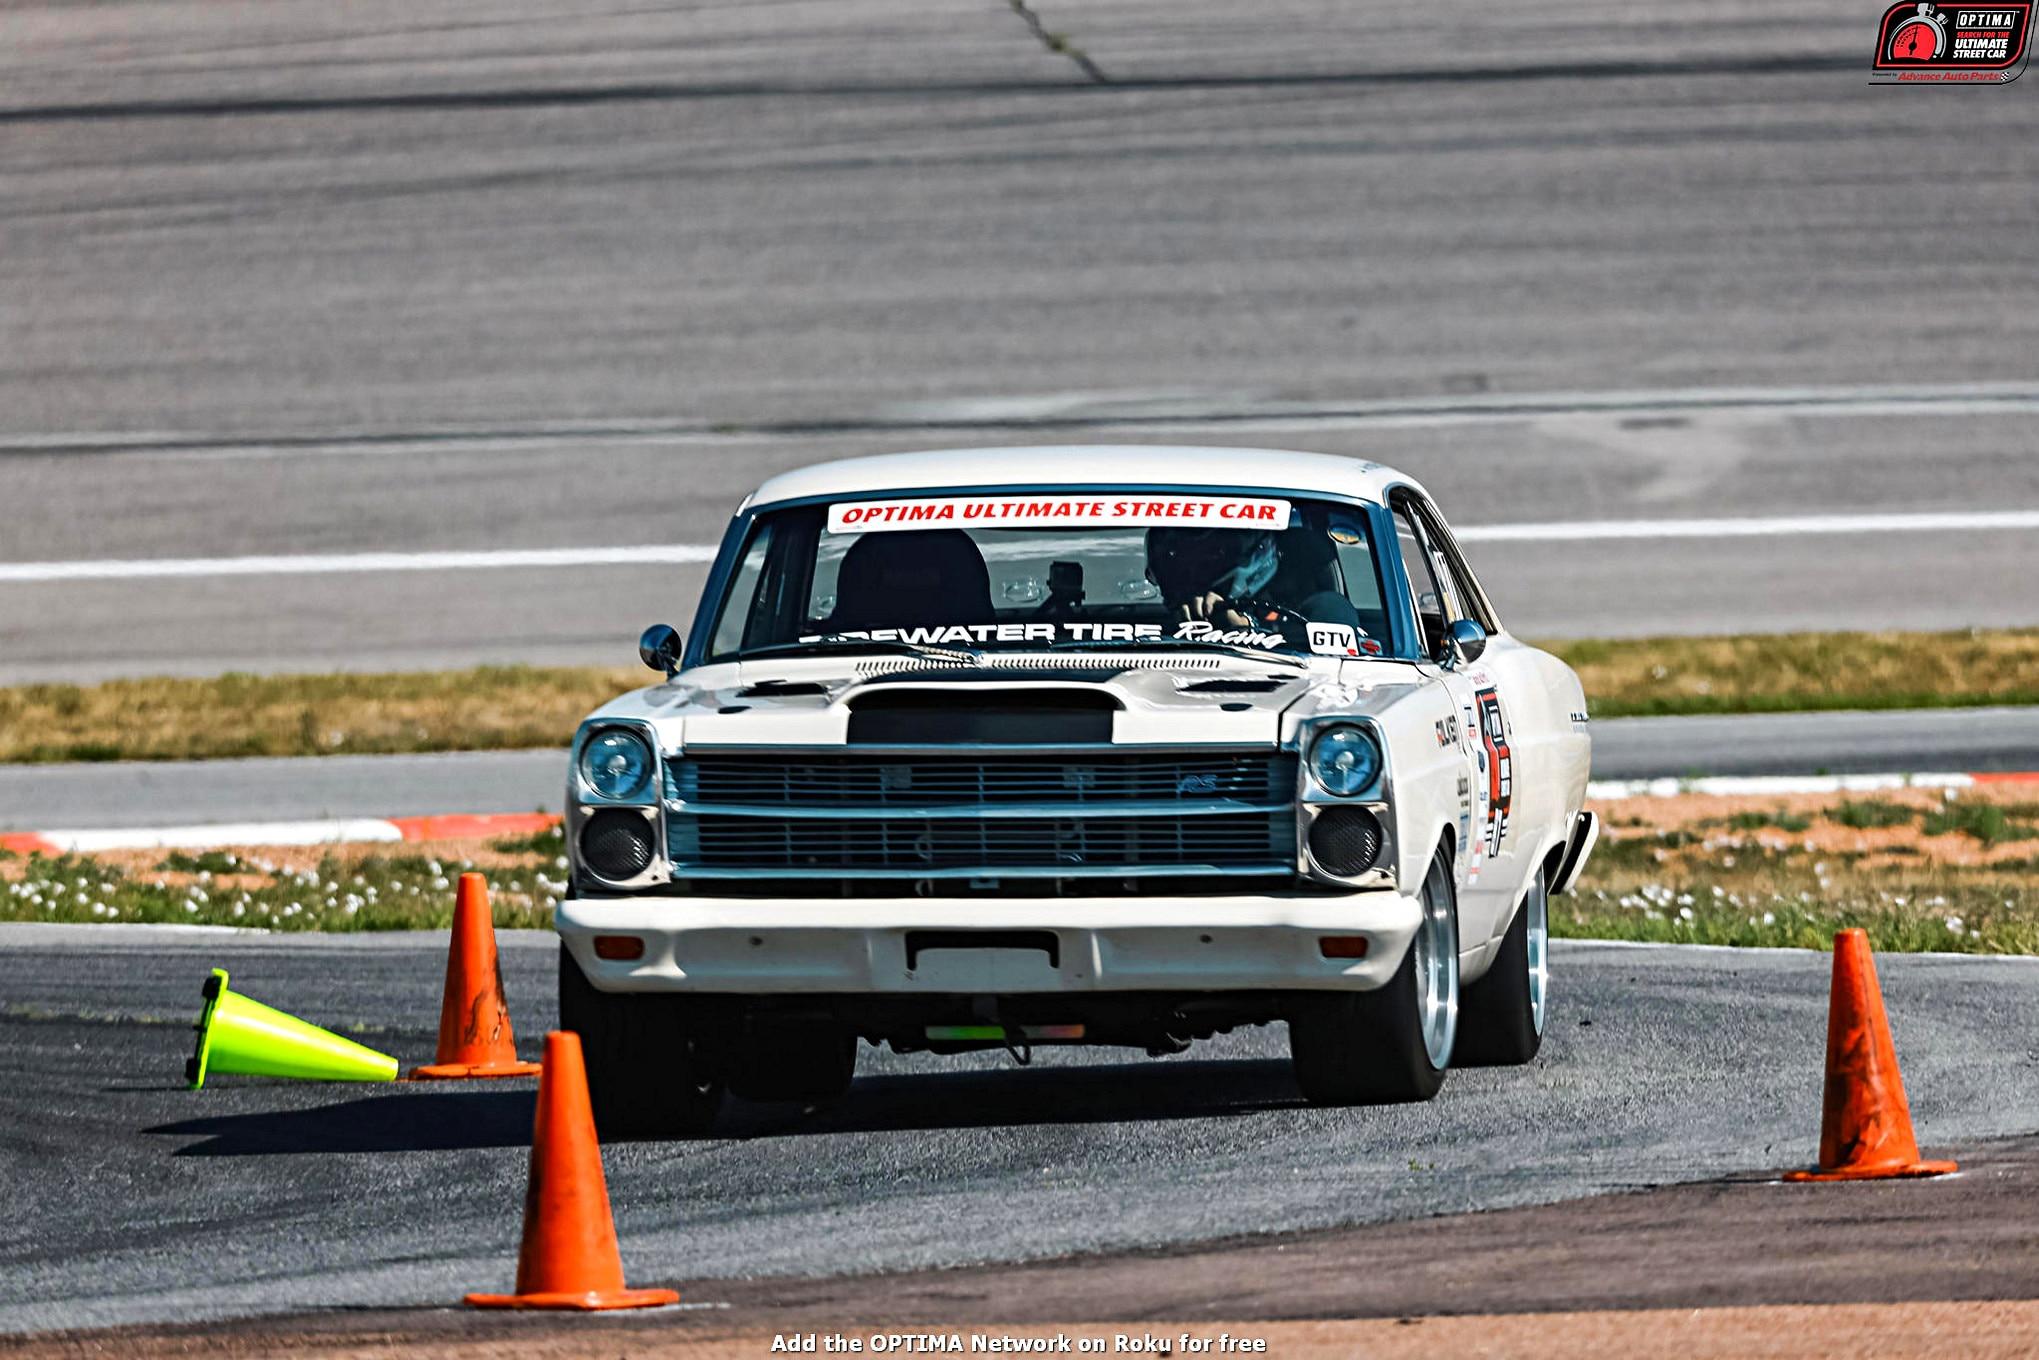 John McKissack 1966 Ford Fairlane DriveOPTIMA Pikes Peak International Raceway 2018 37